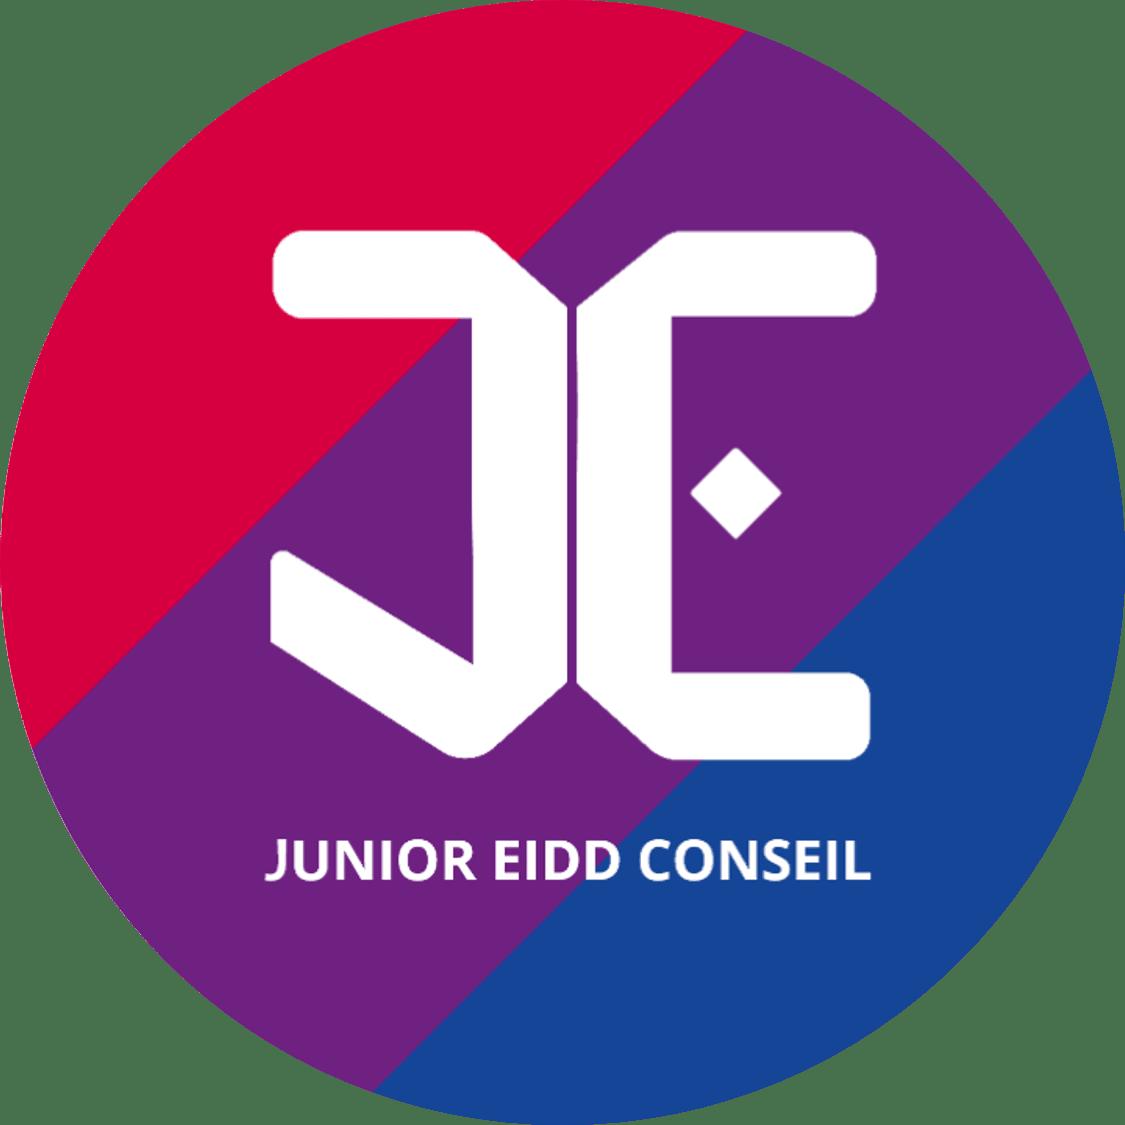 Junior EIDD Conseil